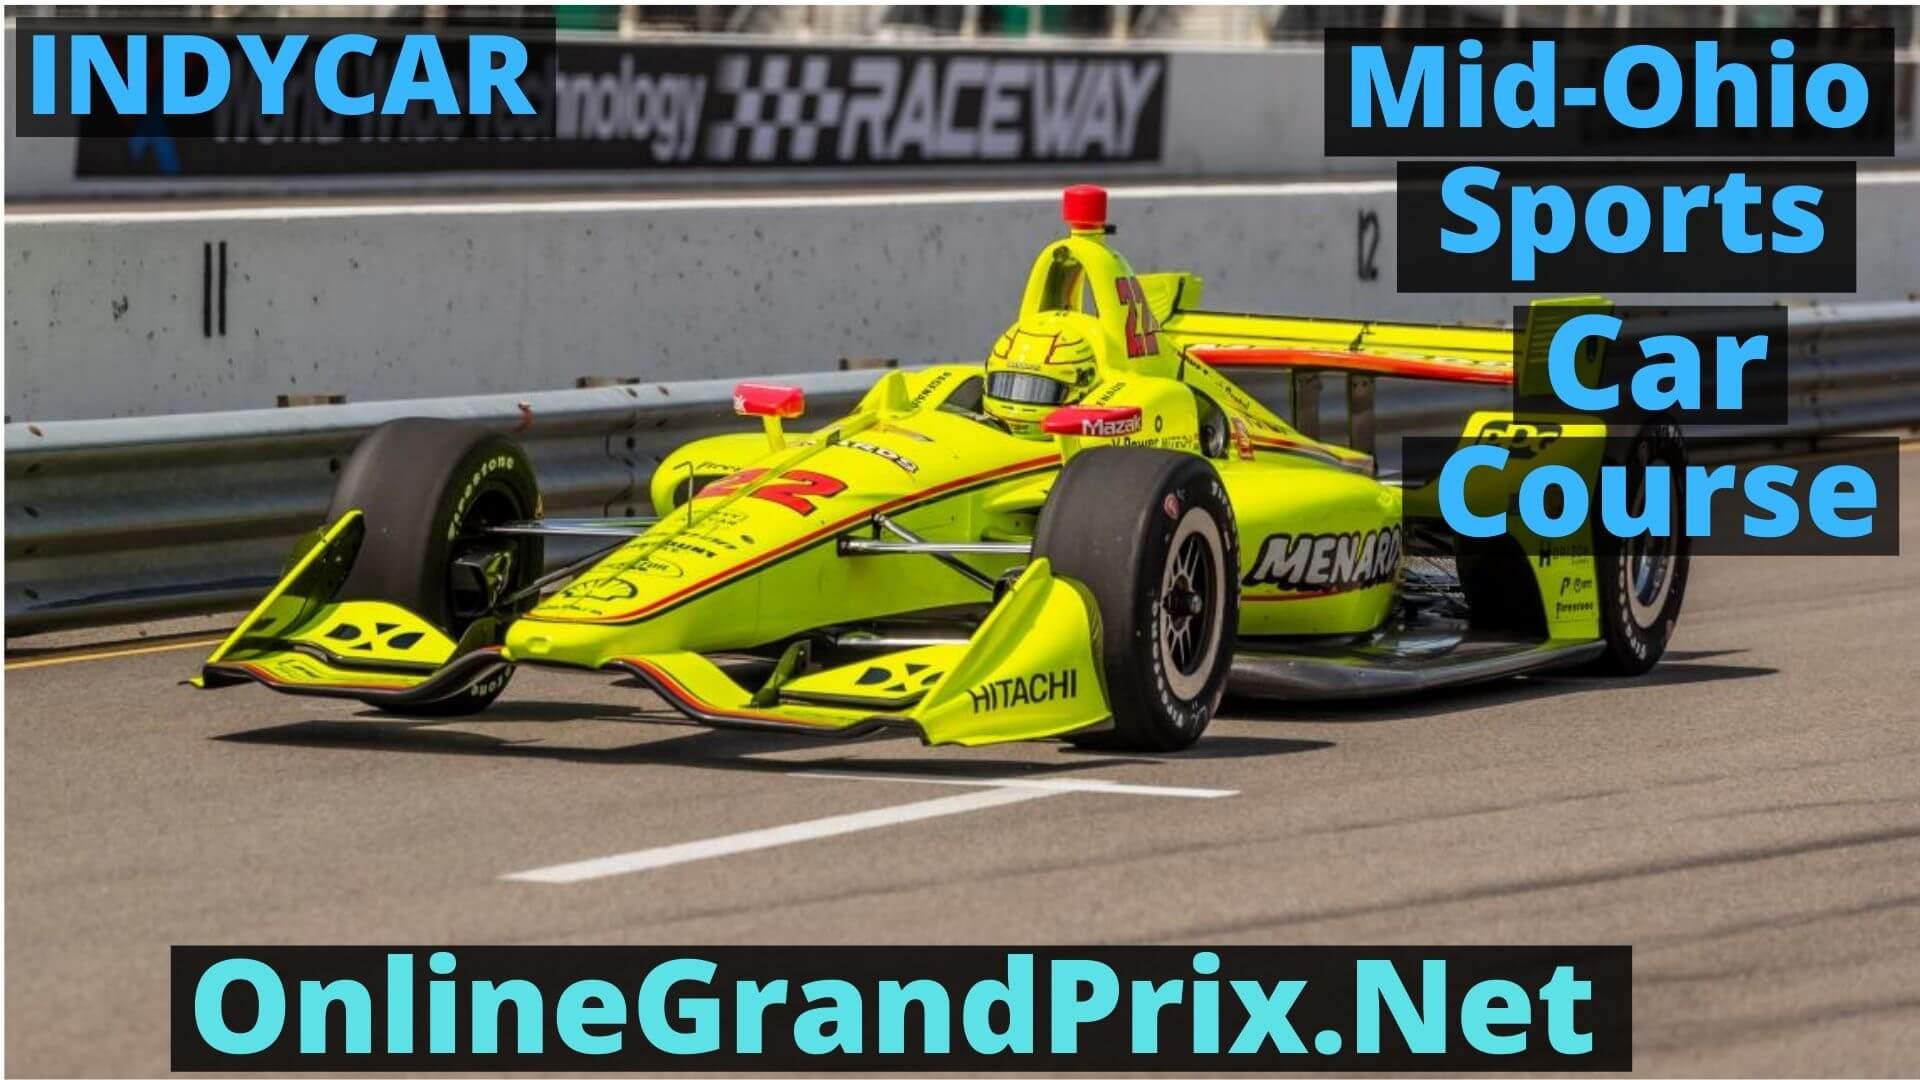 Honda Indy 200 Live Stream 2020 | Indycar